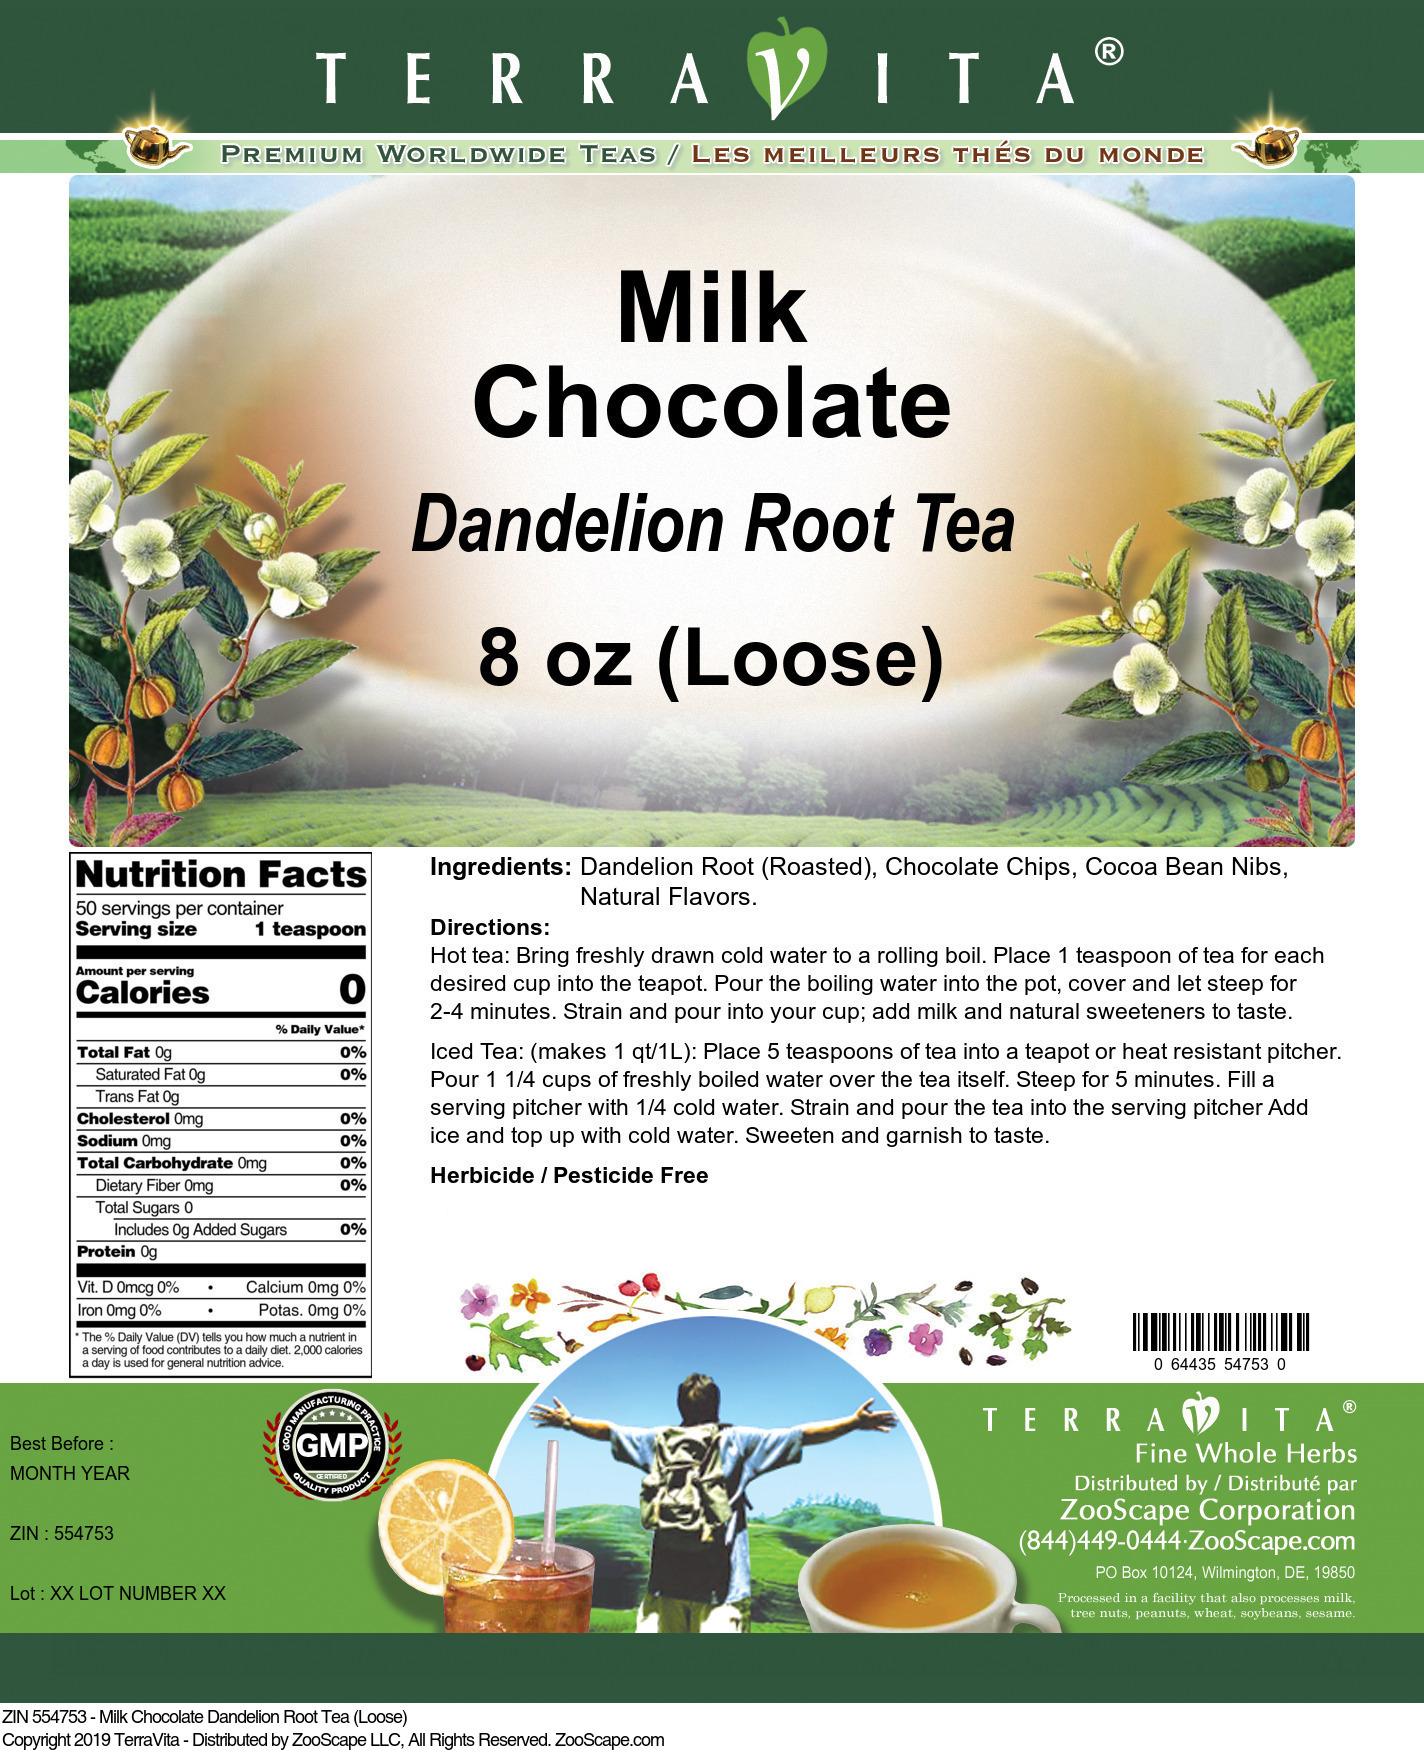 Milk Chocolate Dandelion Root Tea (Loose)